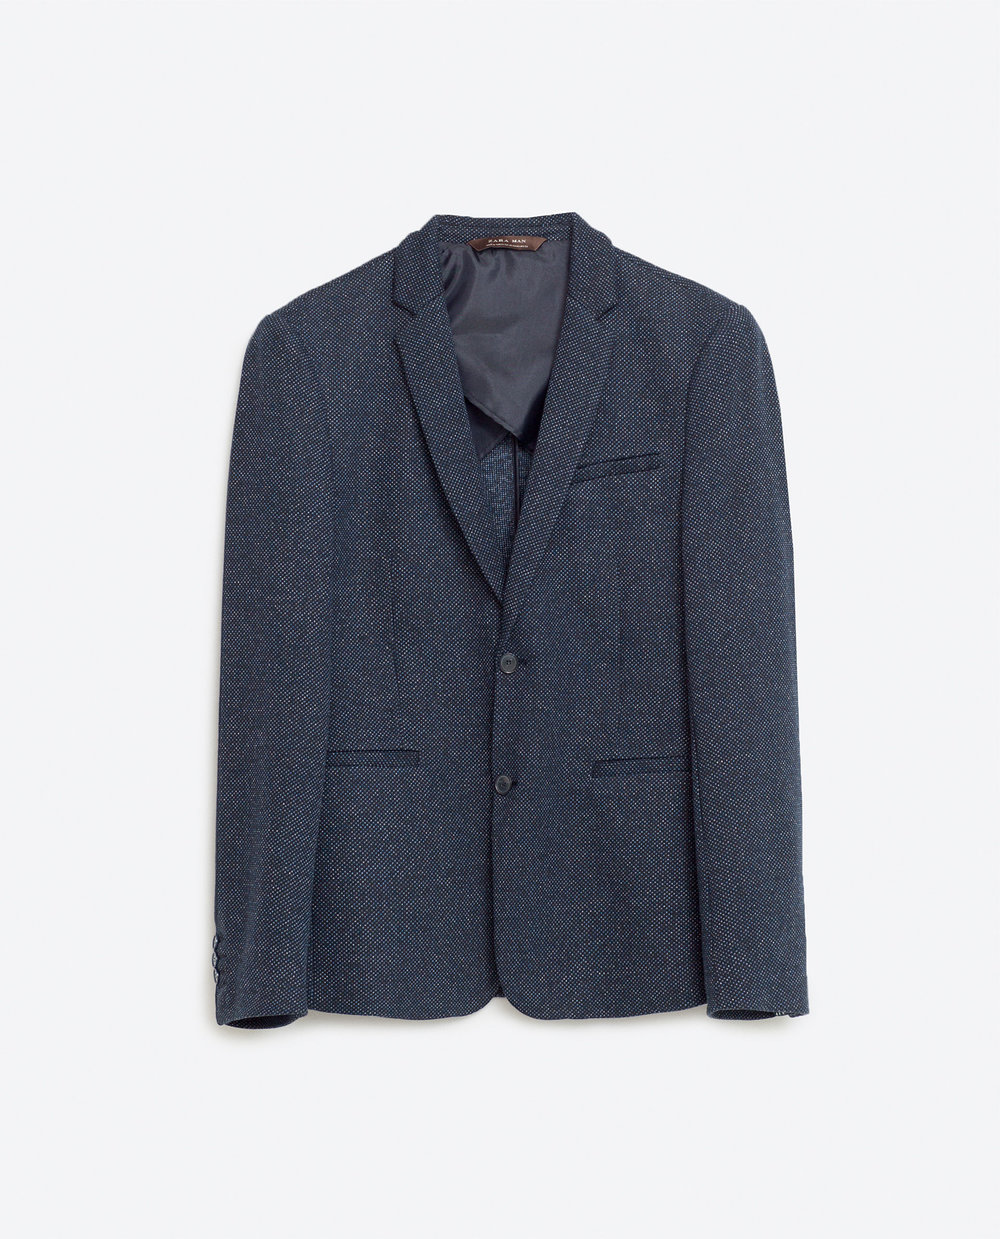 Basic blazer, £59.99 (zara.com)